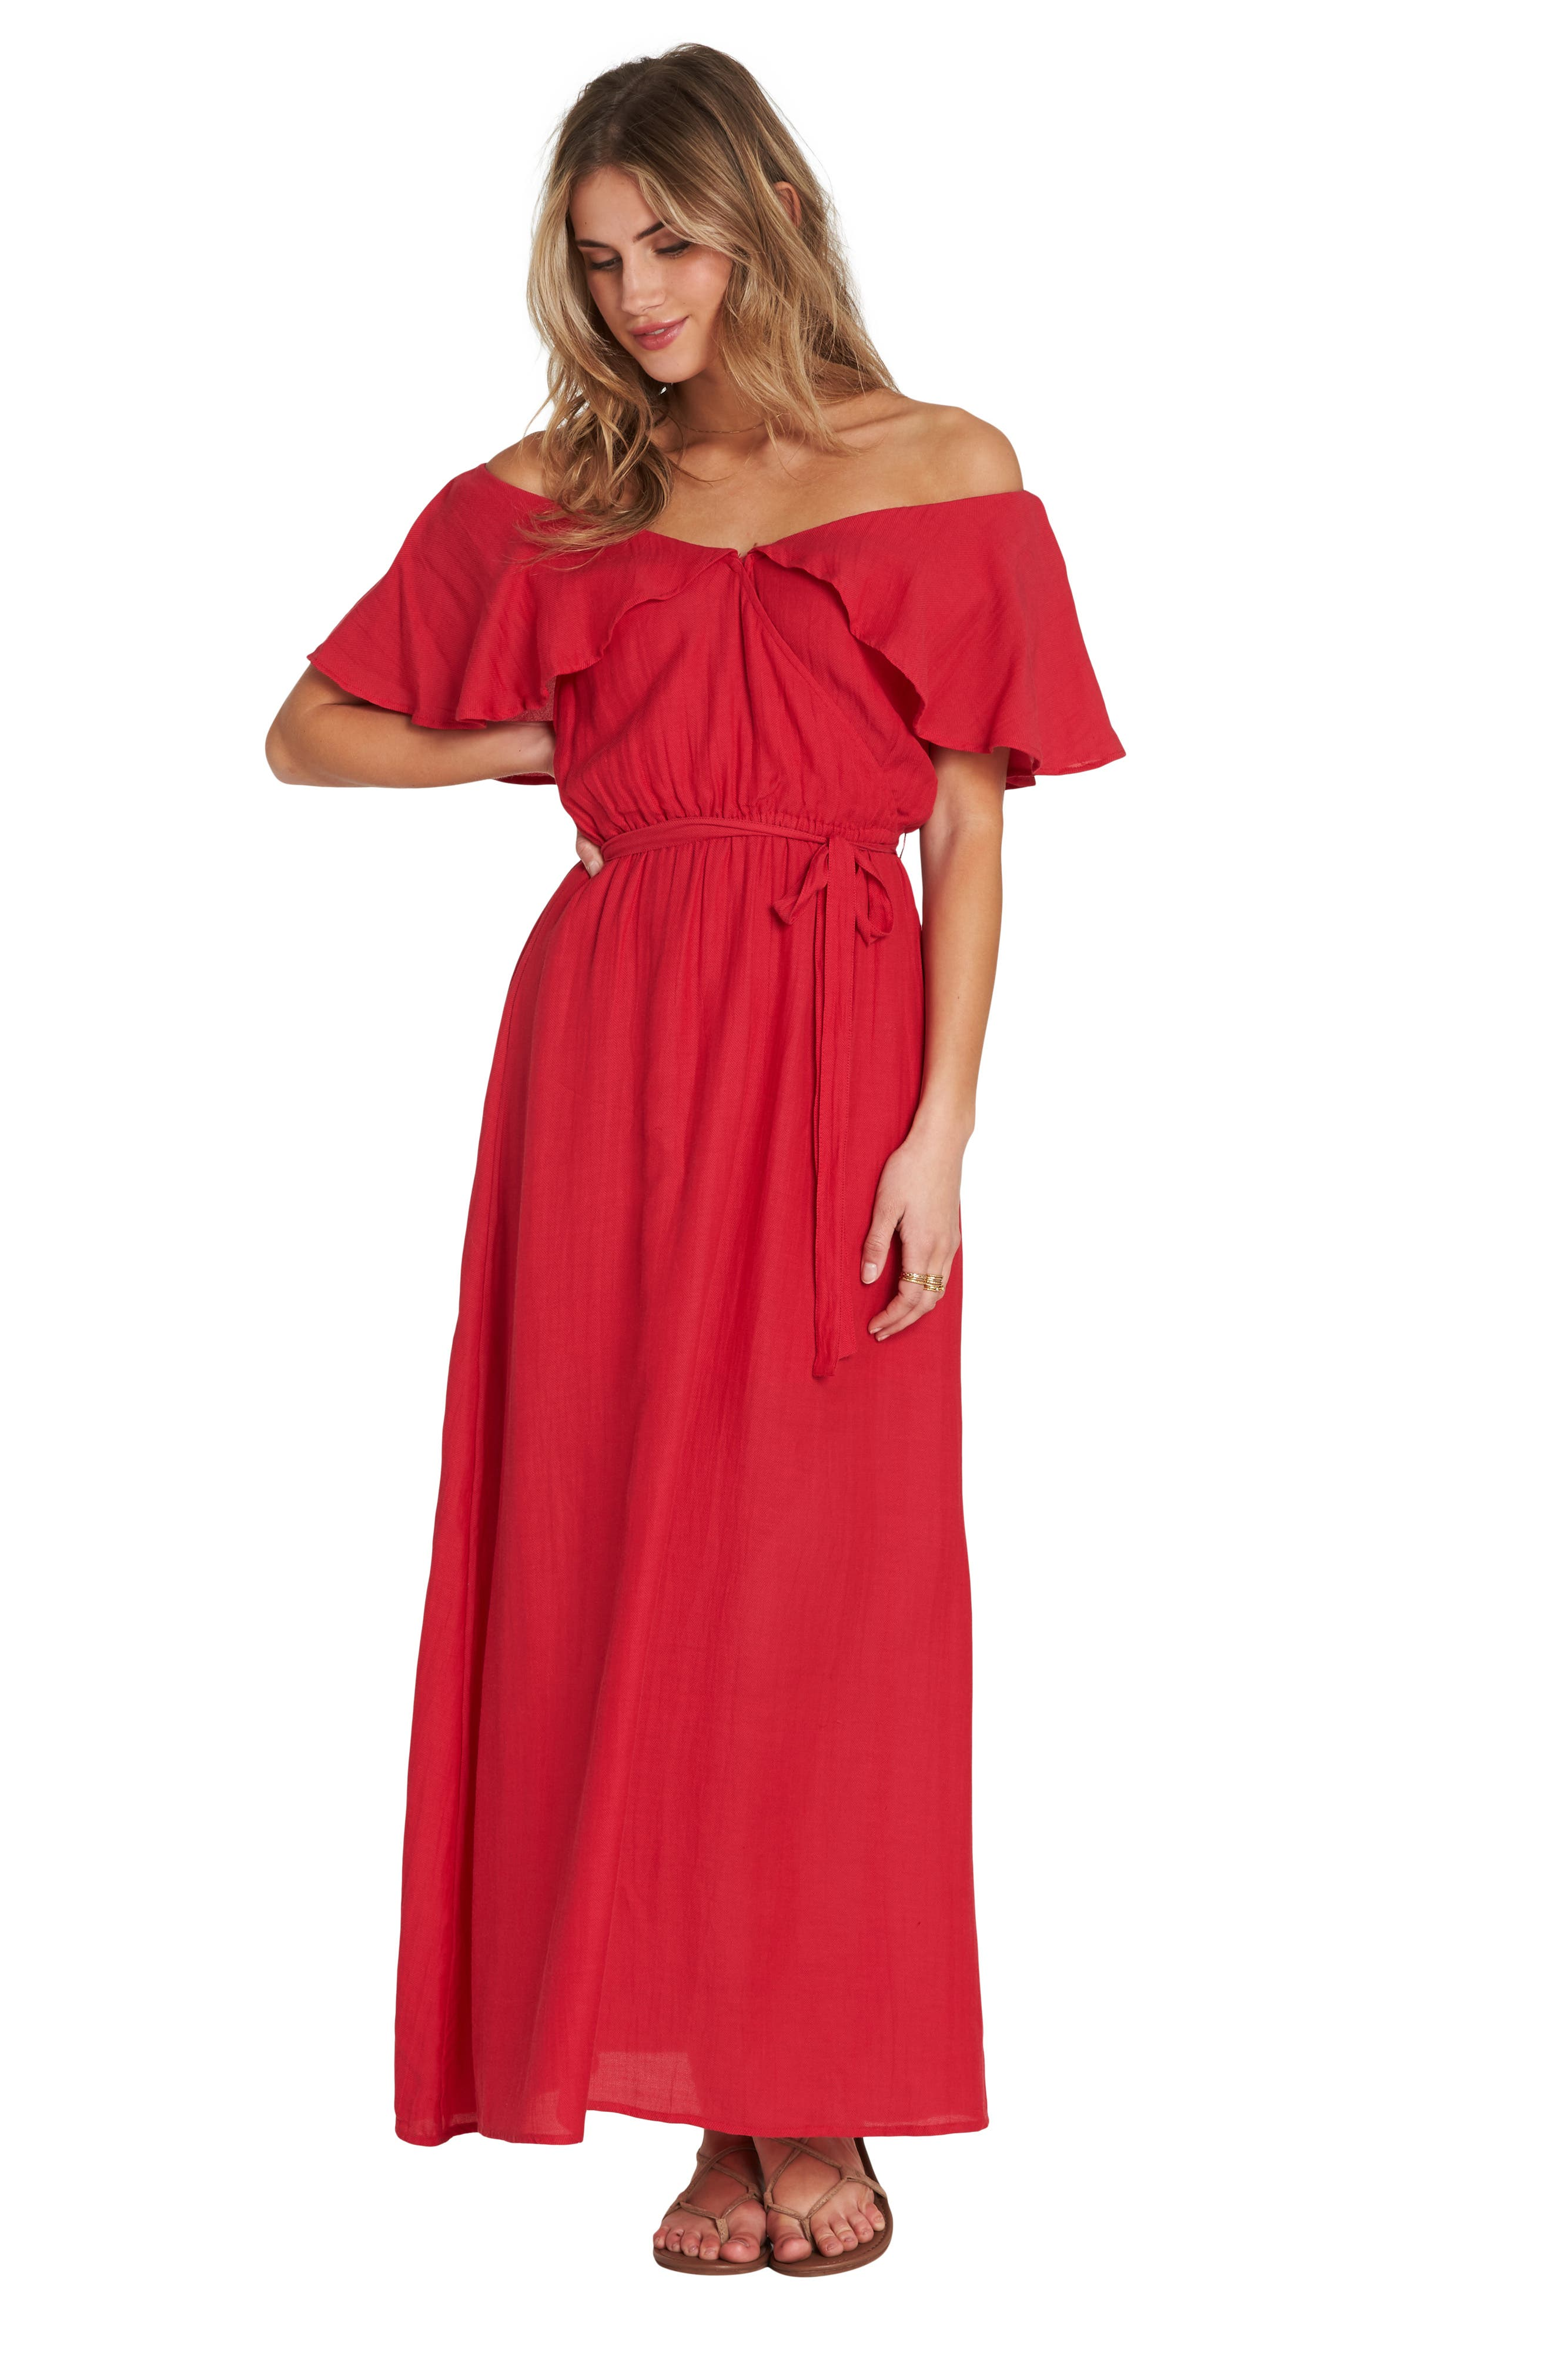 Dance All Night Maxi Dress,                             Alternate thumbnail 4, color,                             GARNET